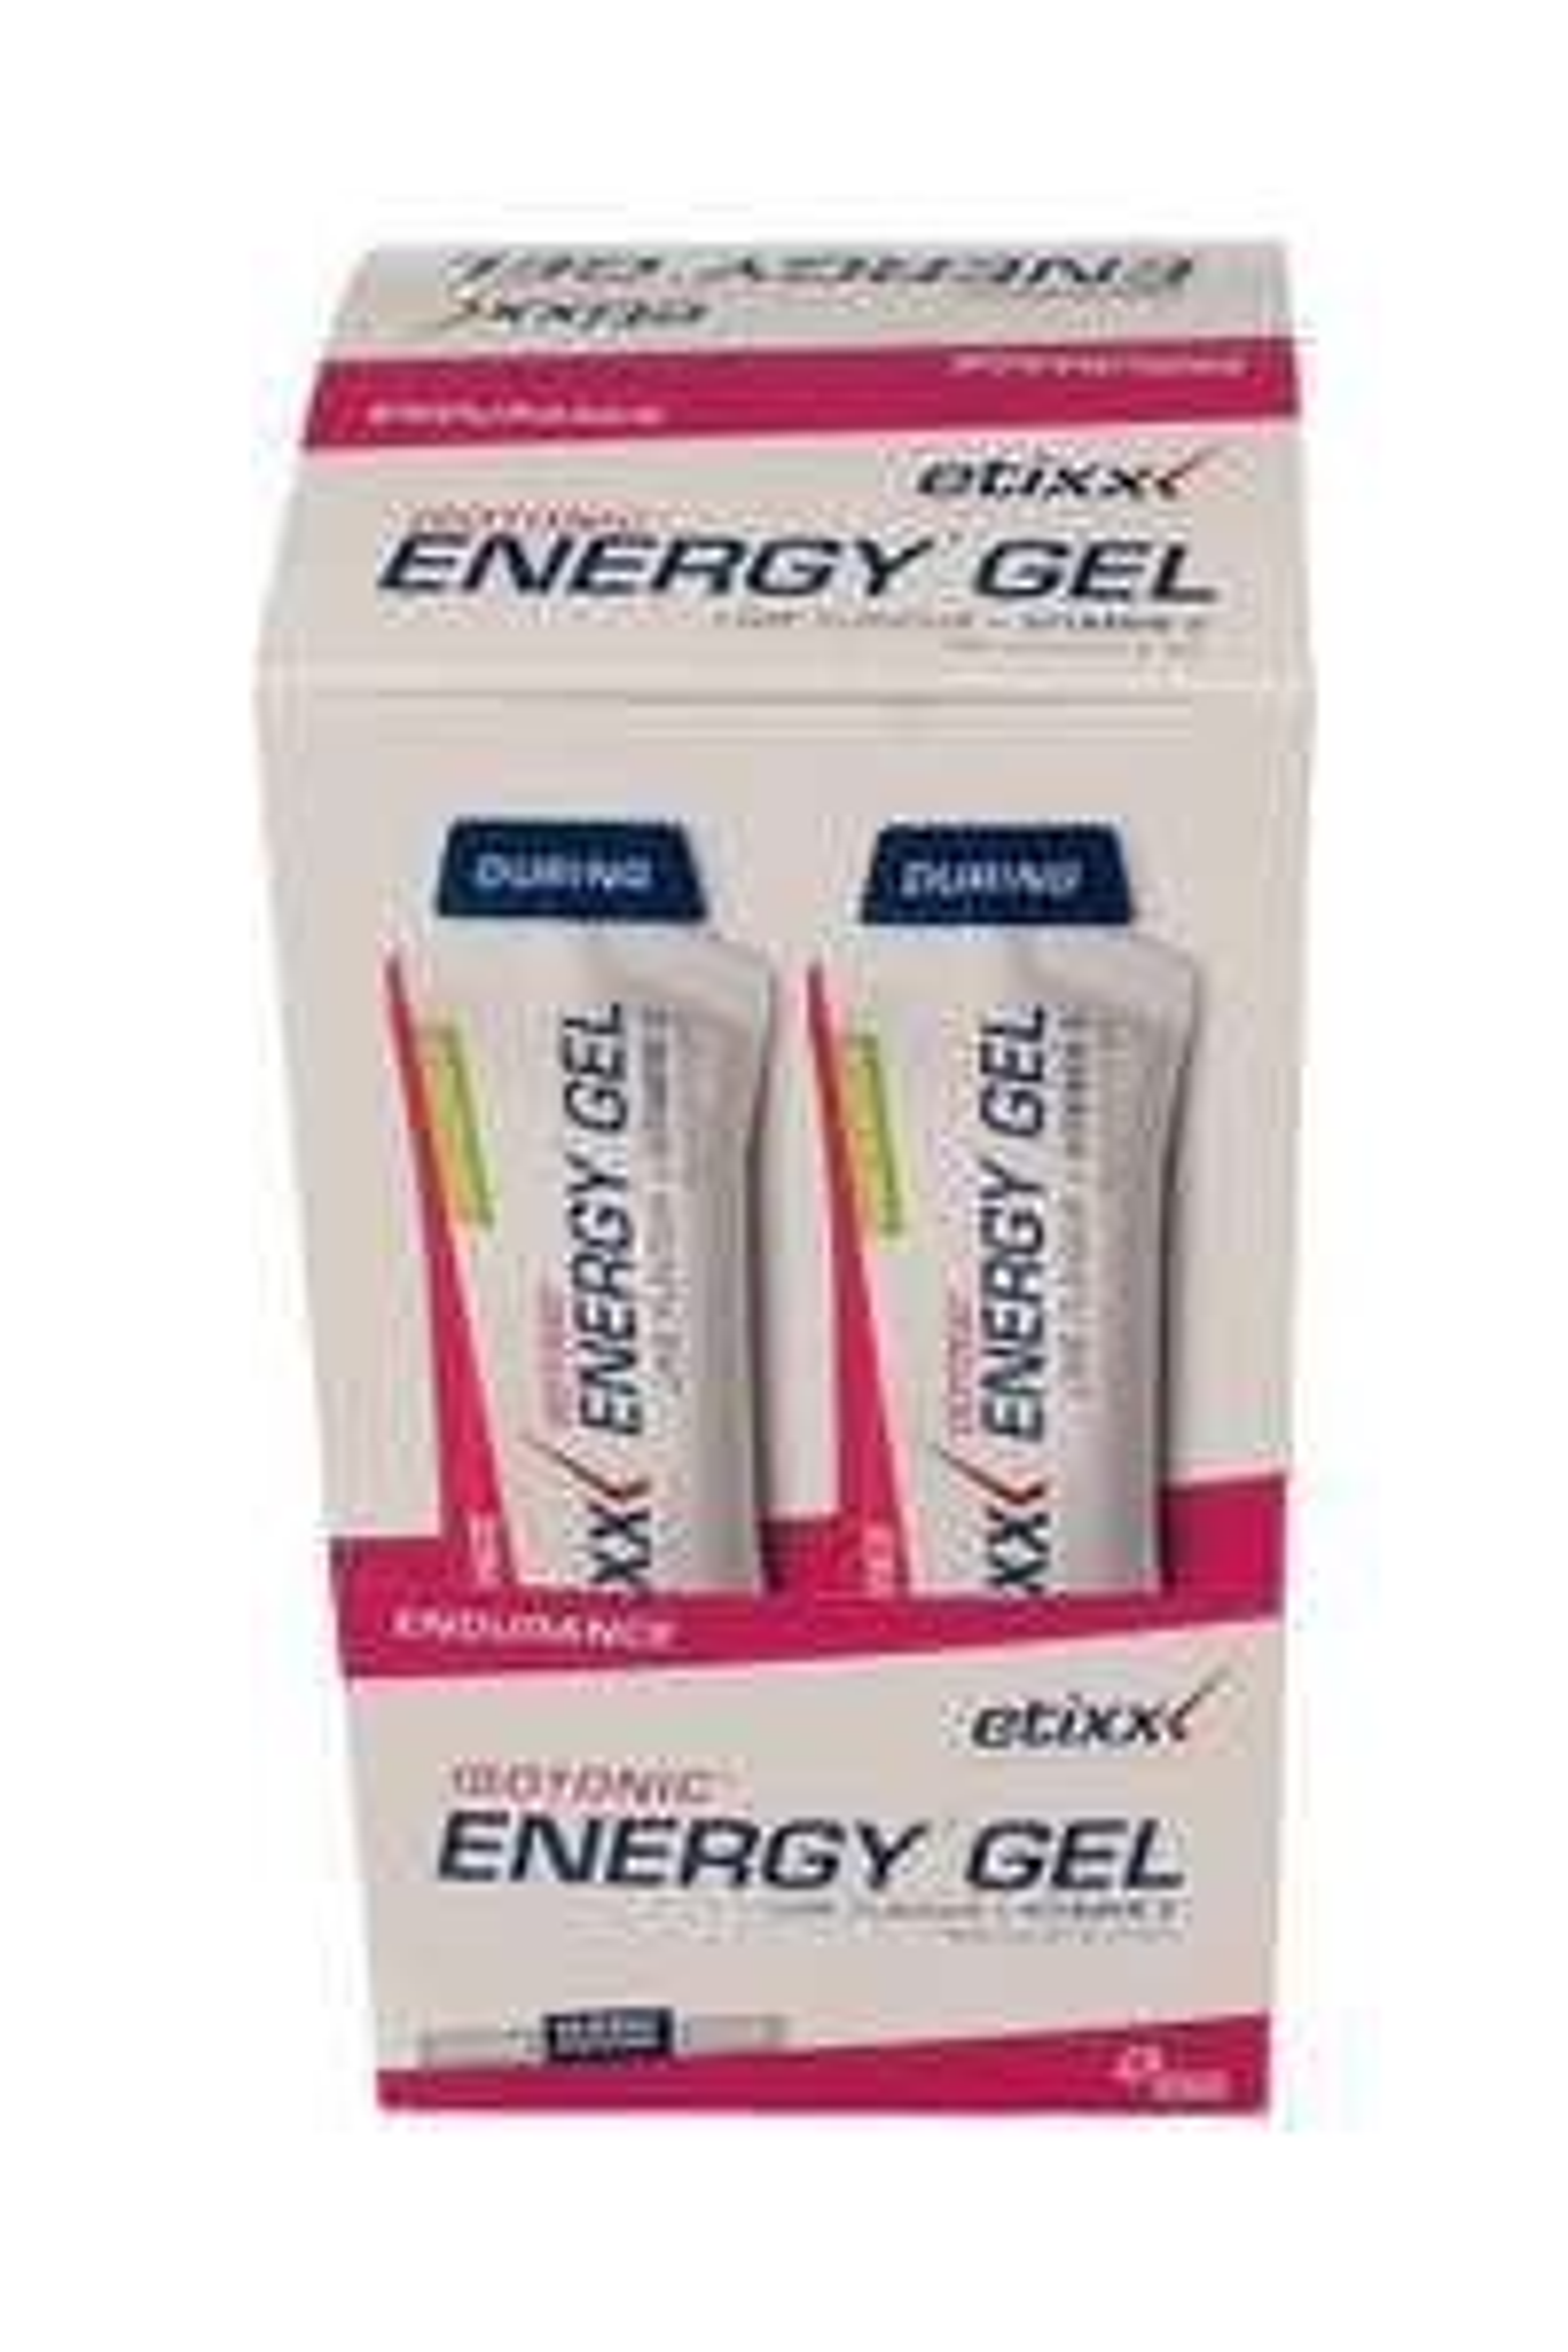 Etixx Endurance Isotonic Energy Gel Lime (12x40g) voor €5,75 @ Wehkamp